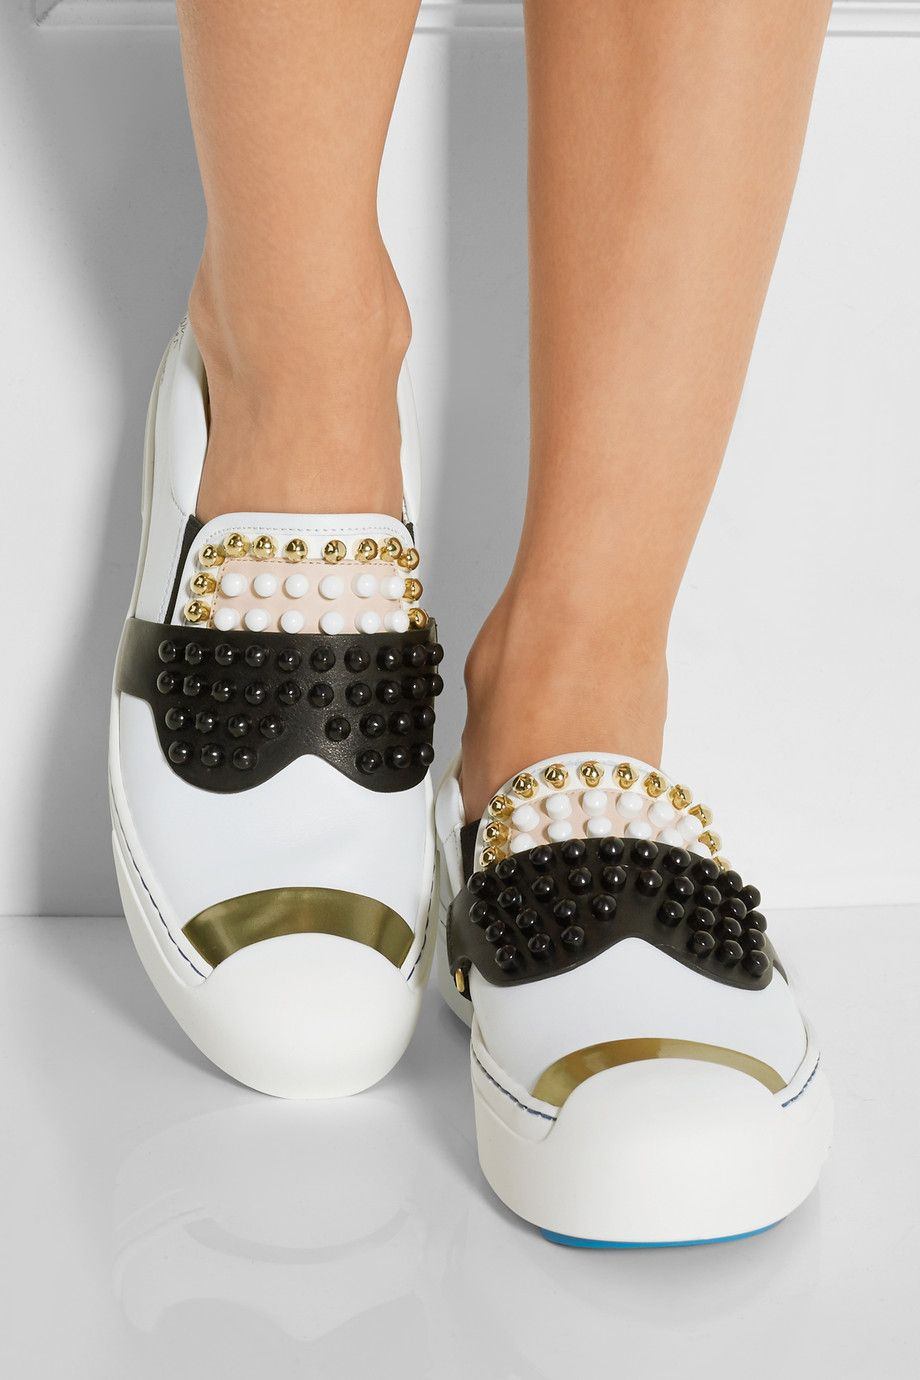 Skate shoes knox city - Fendi Karlito Studded Leather Sneakers Net A Porter Com